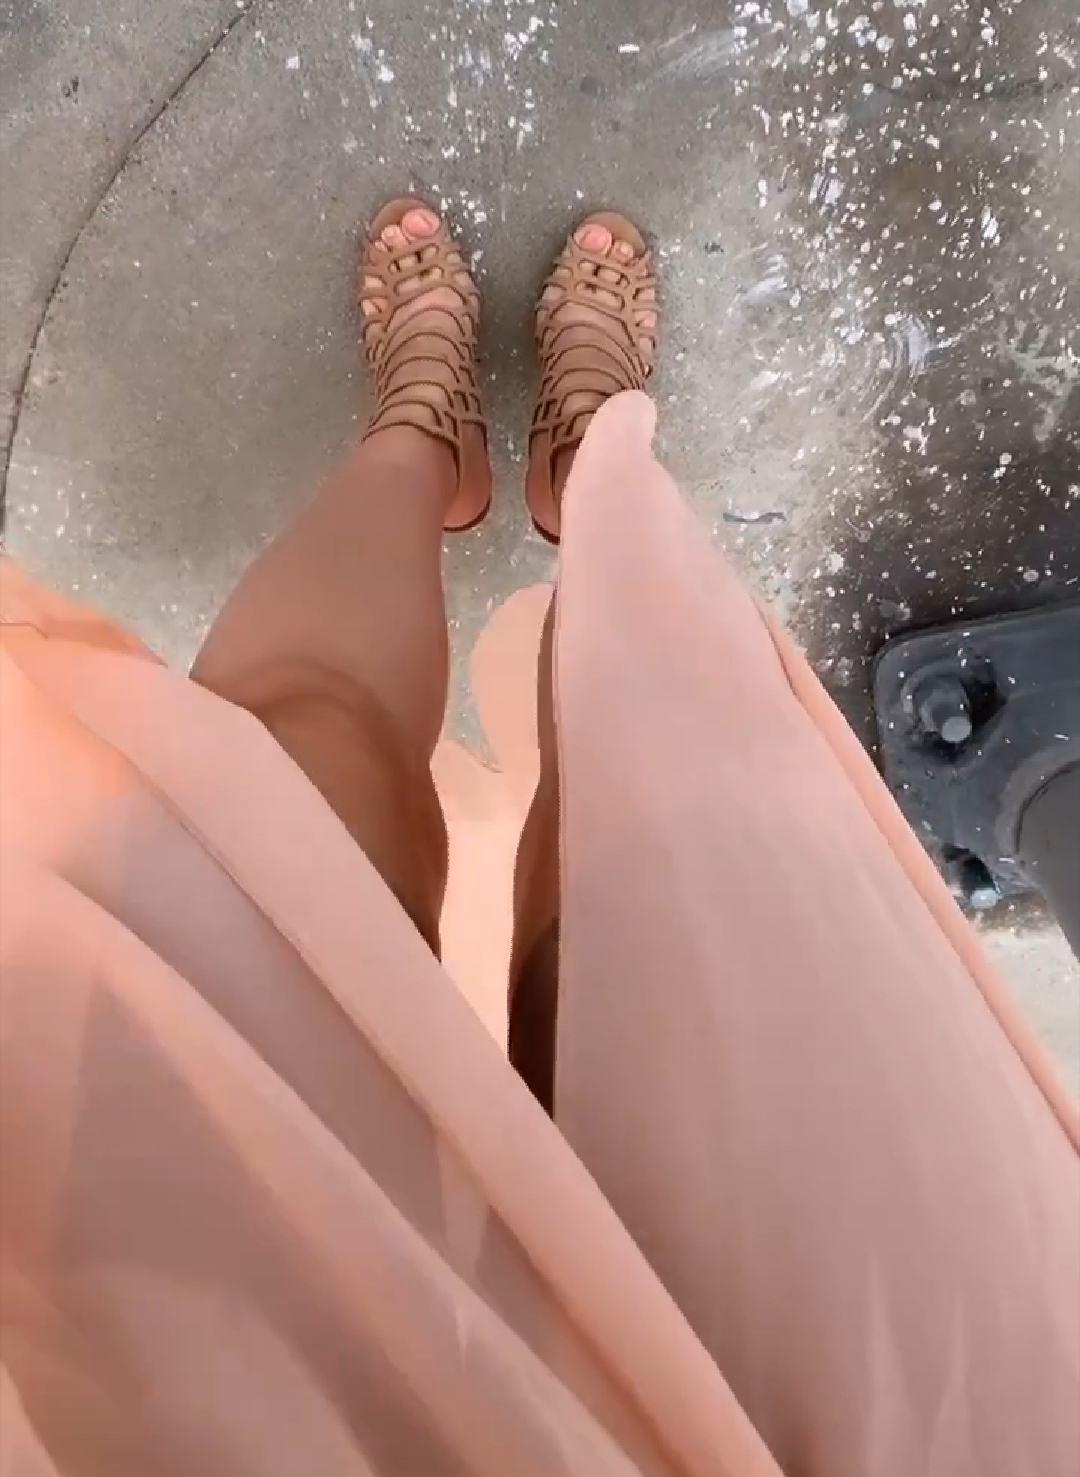 Anastasia Baranova Hot anastasia baranova's feet << wikifeet